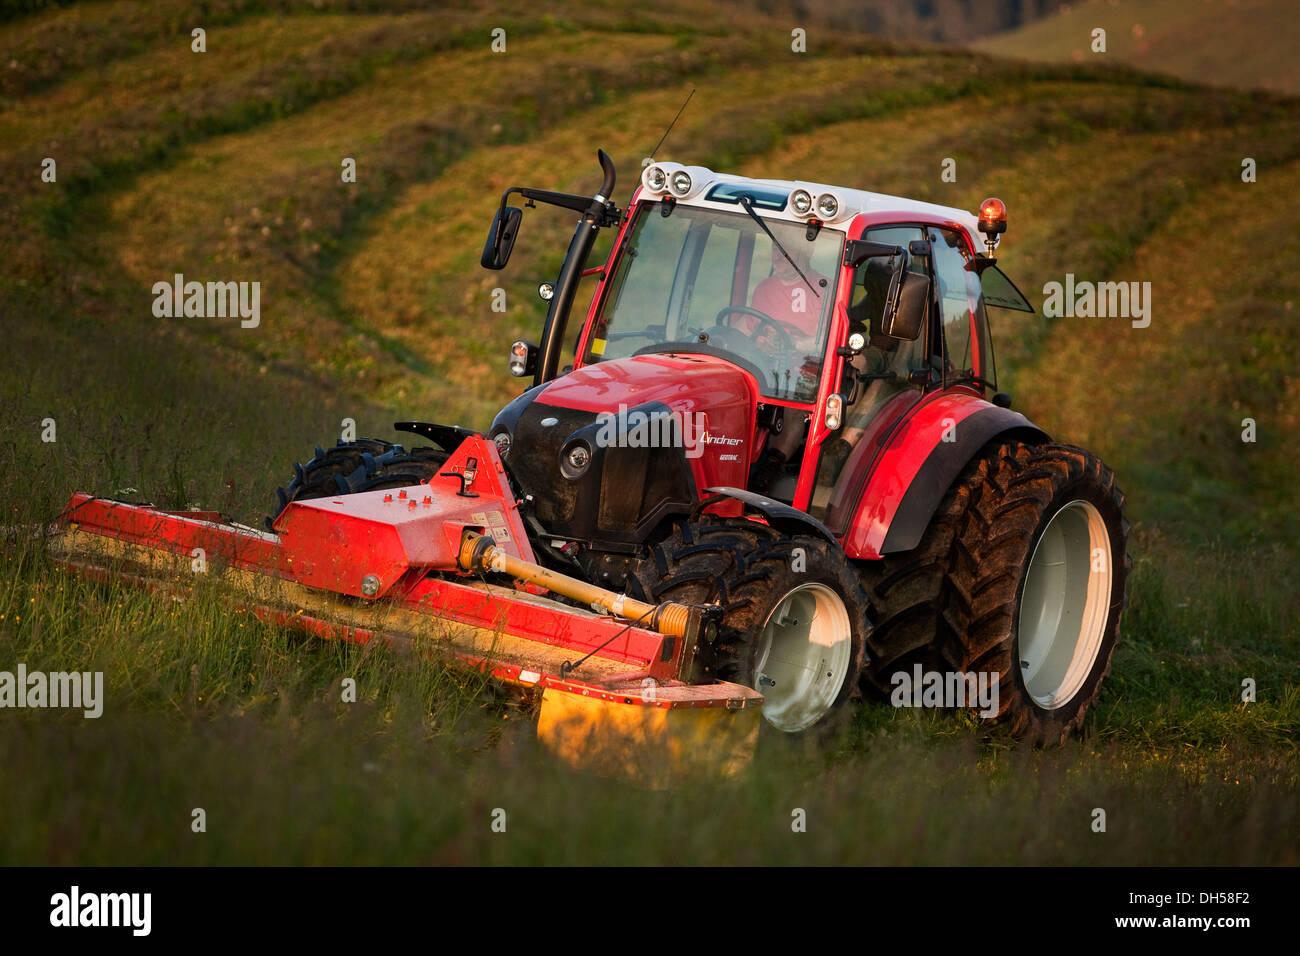 Tractor mowing hay, Söll, Kufstein District, North Tirol, Tirol, Austria - Stock Image